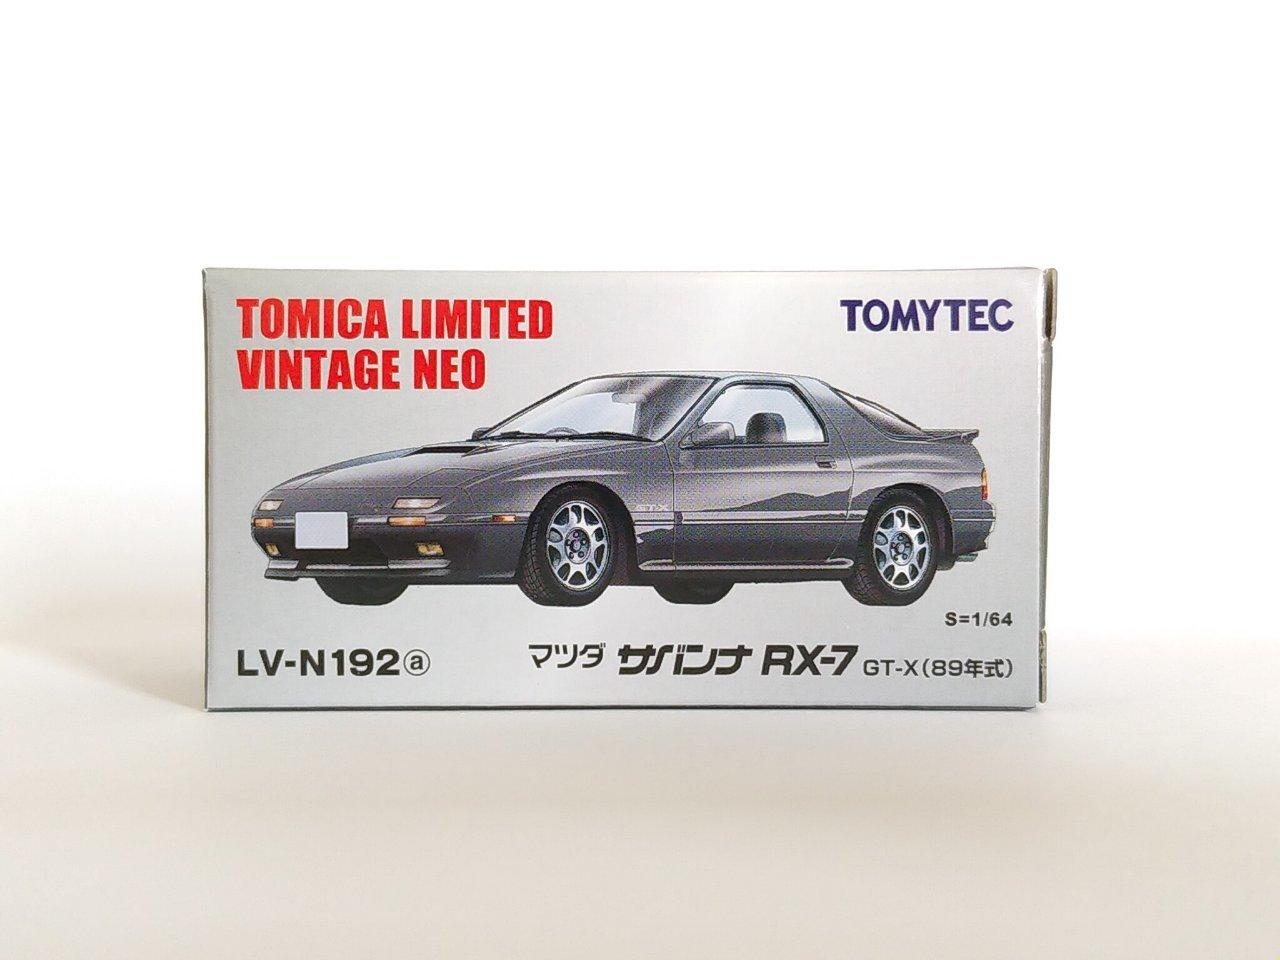 Tomica Limited Vintage Neo 1//64 LV-N192a Mazda Savanna RX-7 GT-X 89 gray F//S